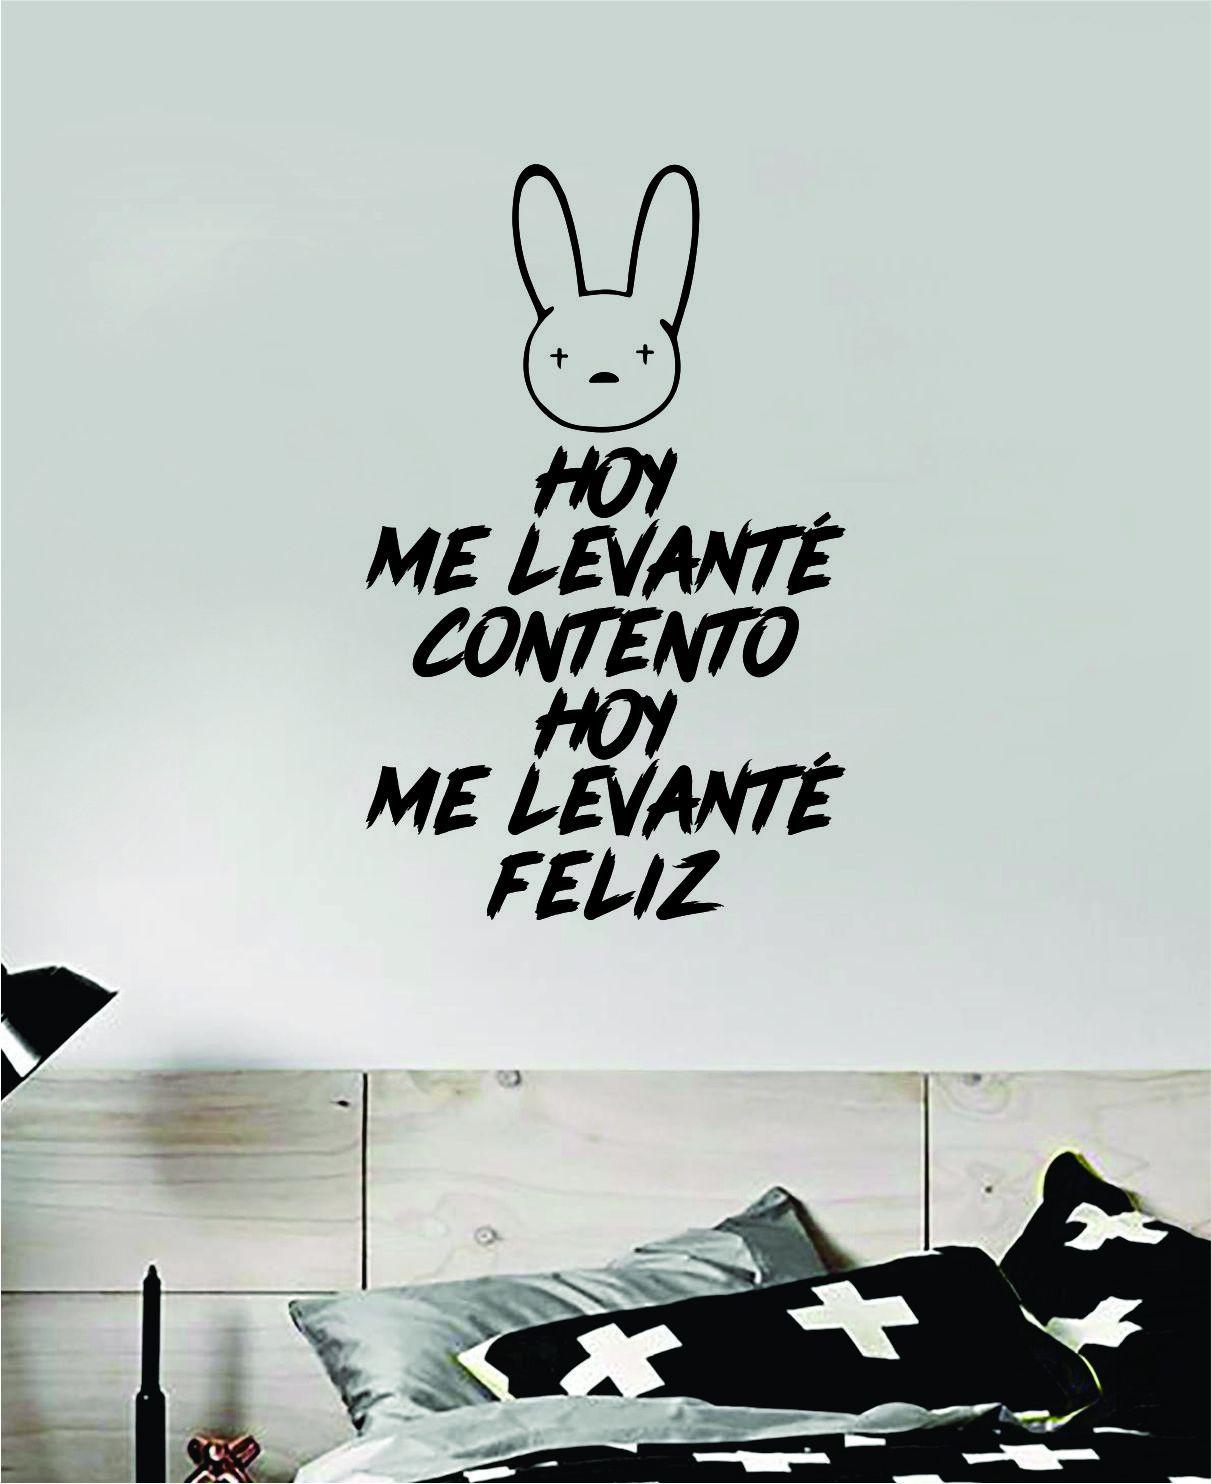 Bad Bunny Hoy Me Levante Feliz YHLQMDLG Wall Decal Home Decor Sticker Vinyl Bedroom Room Quote Spanish Music Reggaeton Girls Funny Teen Lyrics - gold